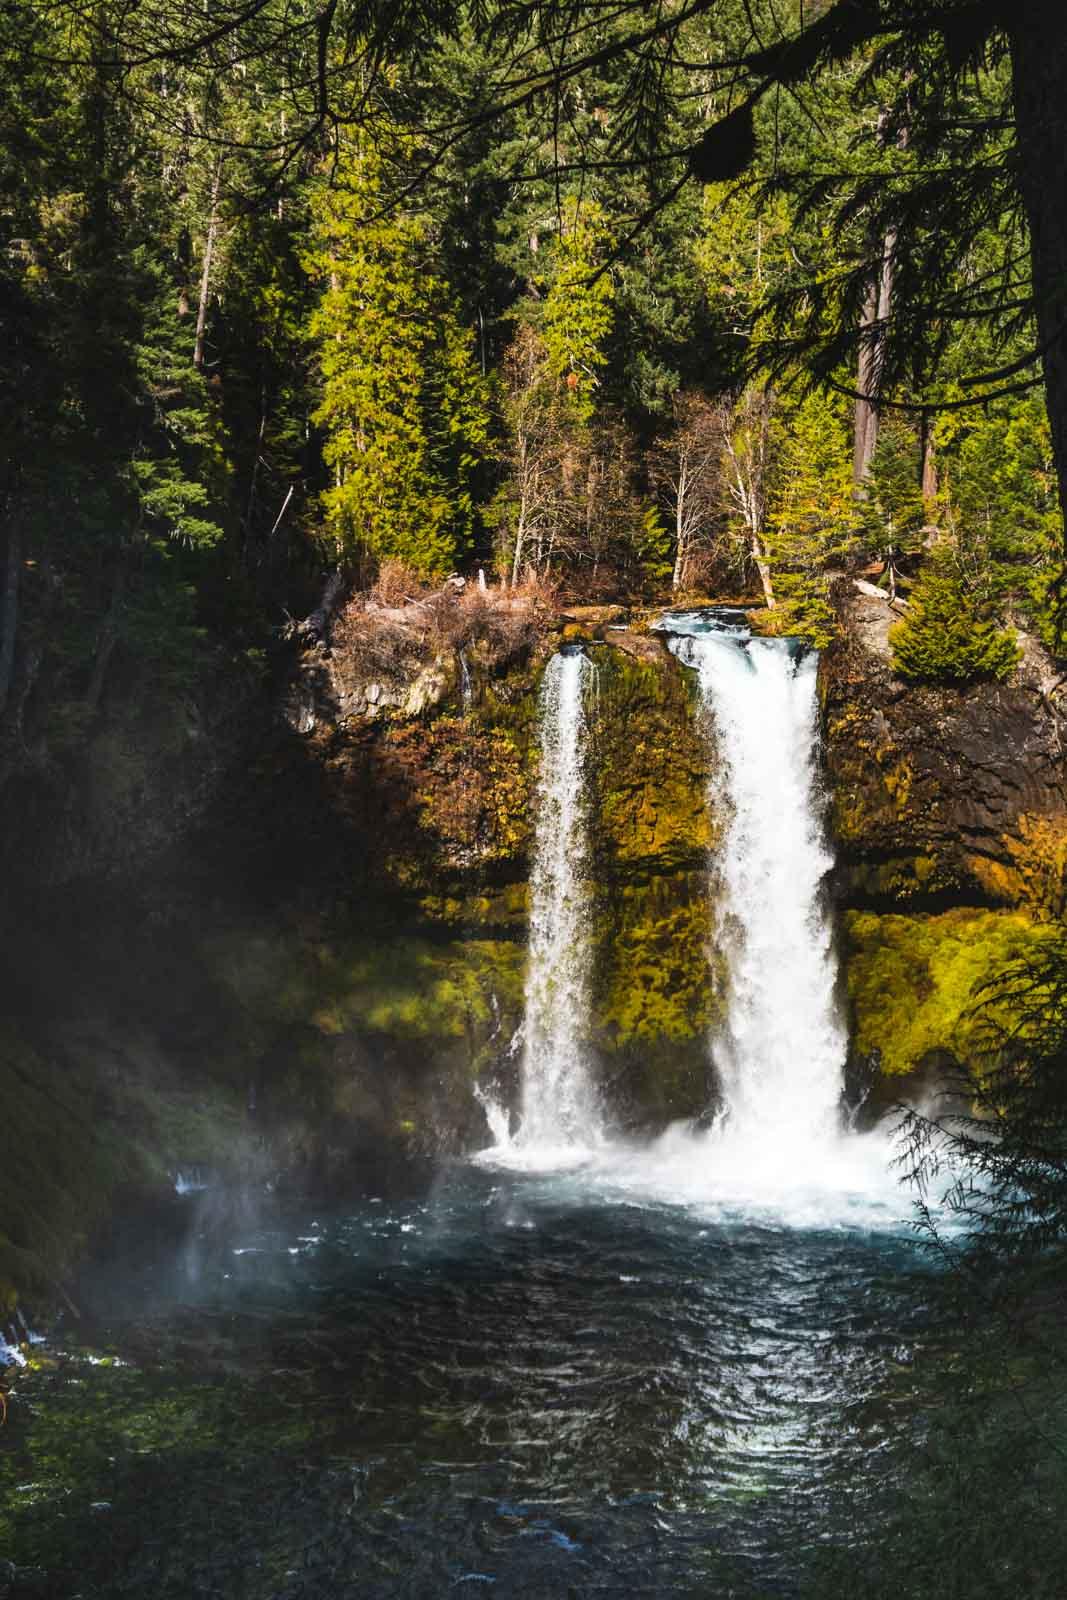 Koosah Falls is an easy Oregon waterfall hike.